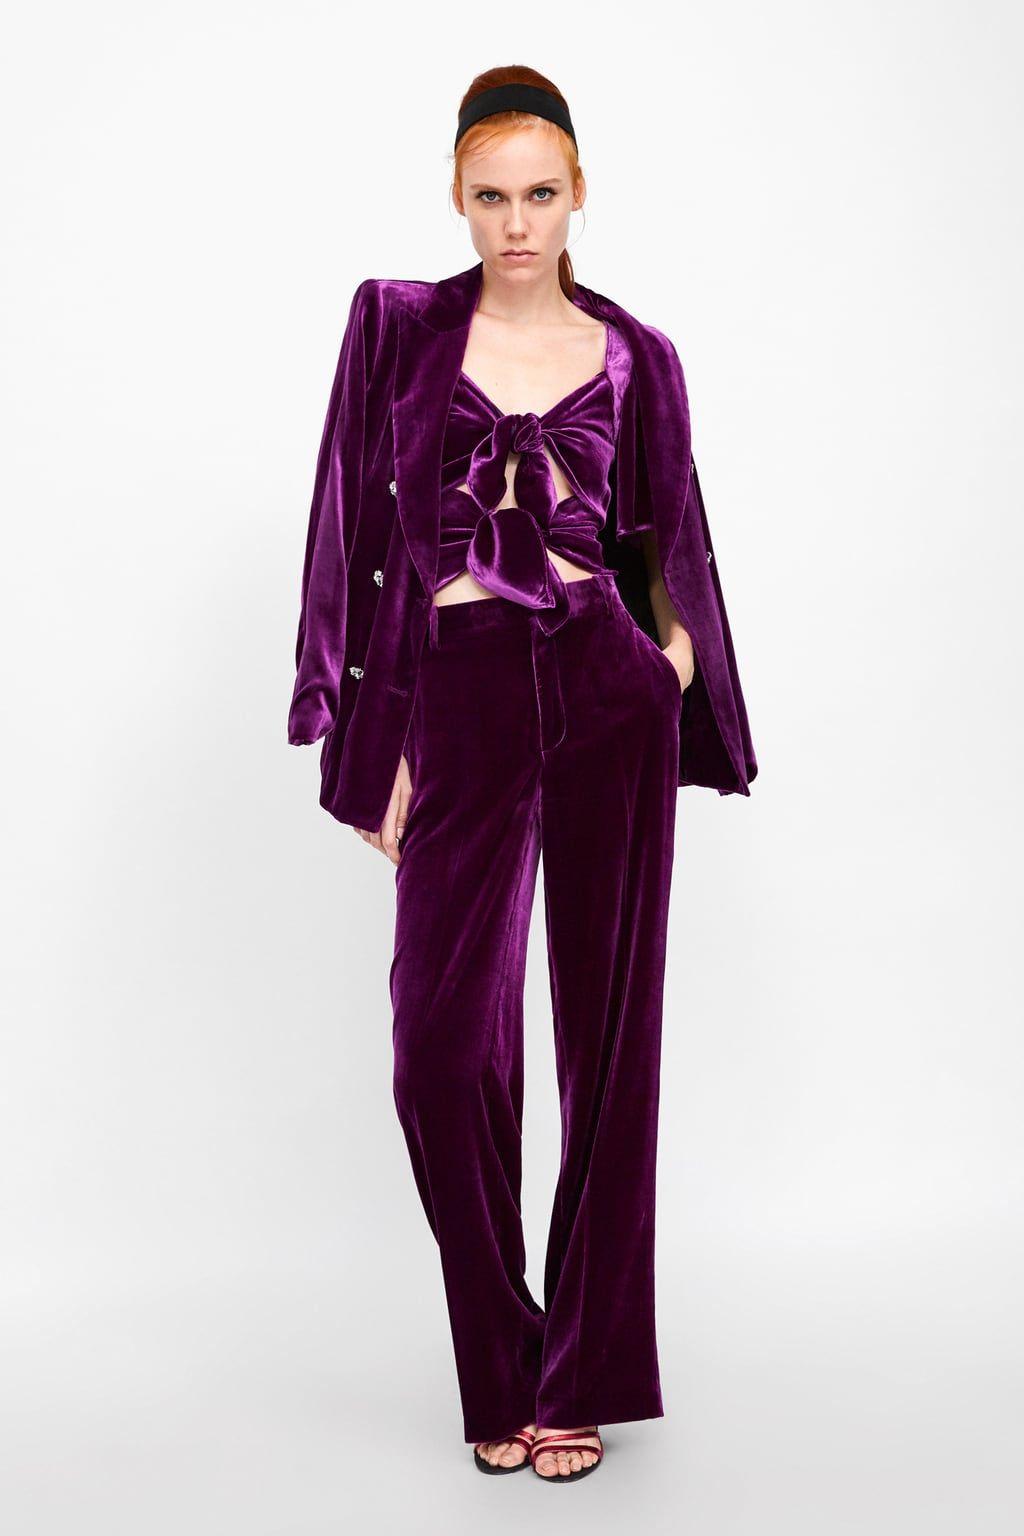 La Tendencia Y TerciopeloEl Dicta Zara Street Style TcK3ulF1J